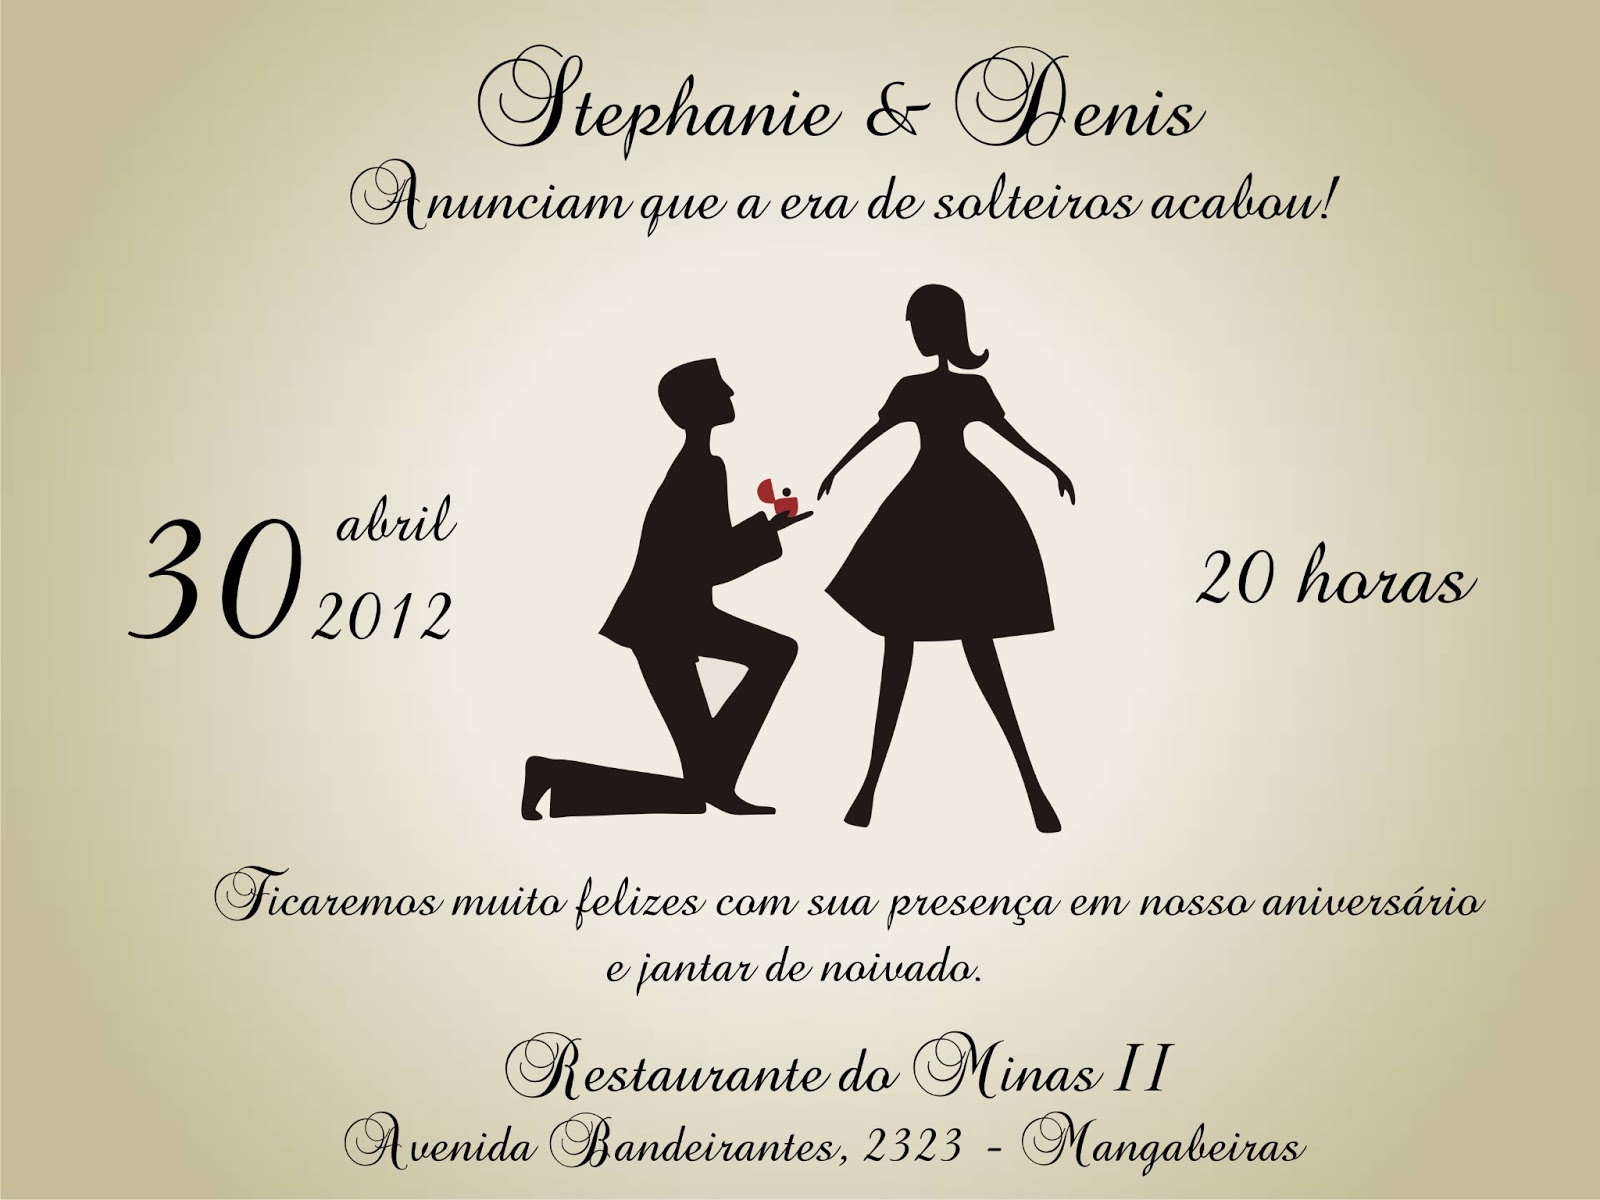 Frases Para Convite De Noivado Evangelico: Ateliê Artes&Mimos: Convite De Noivado